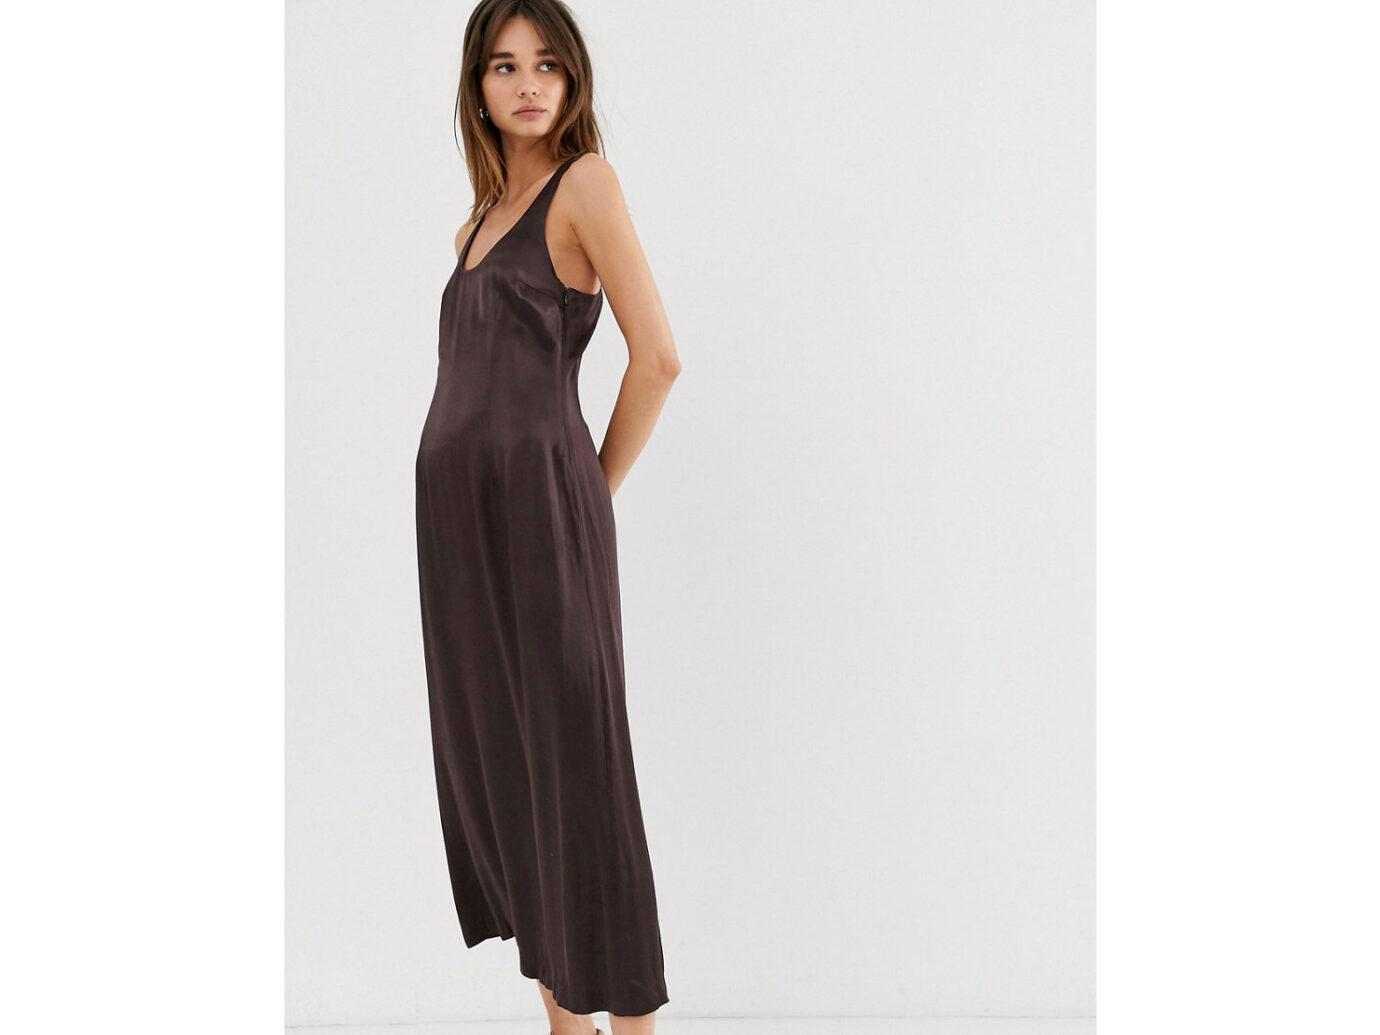 Weekday limited edition satin midi dress in dark brown